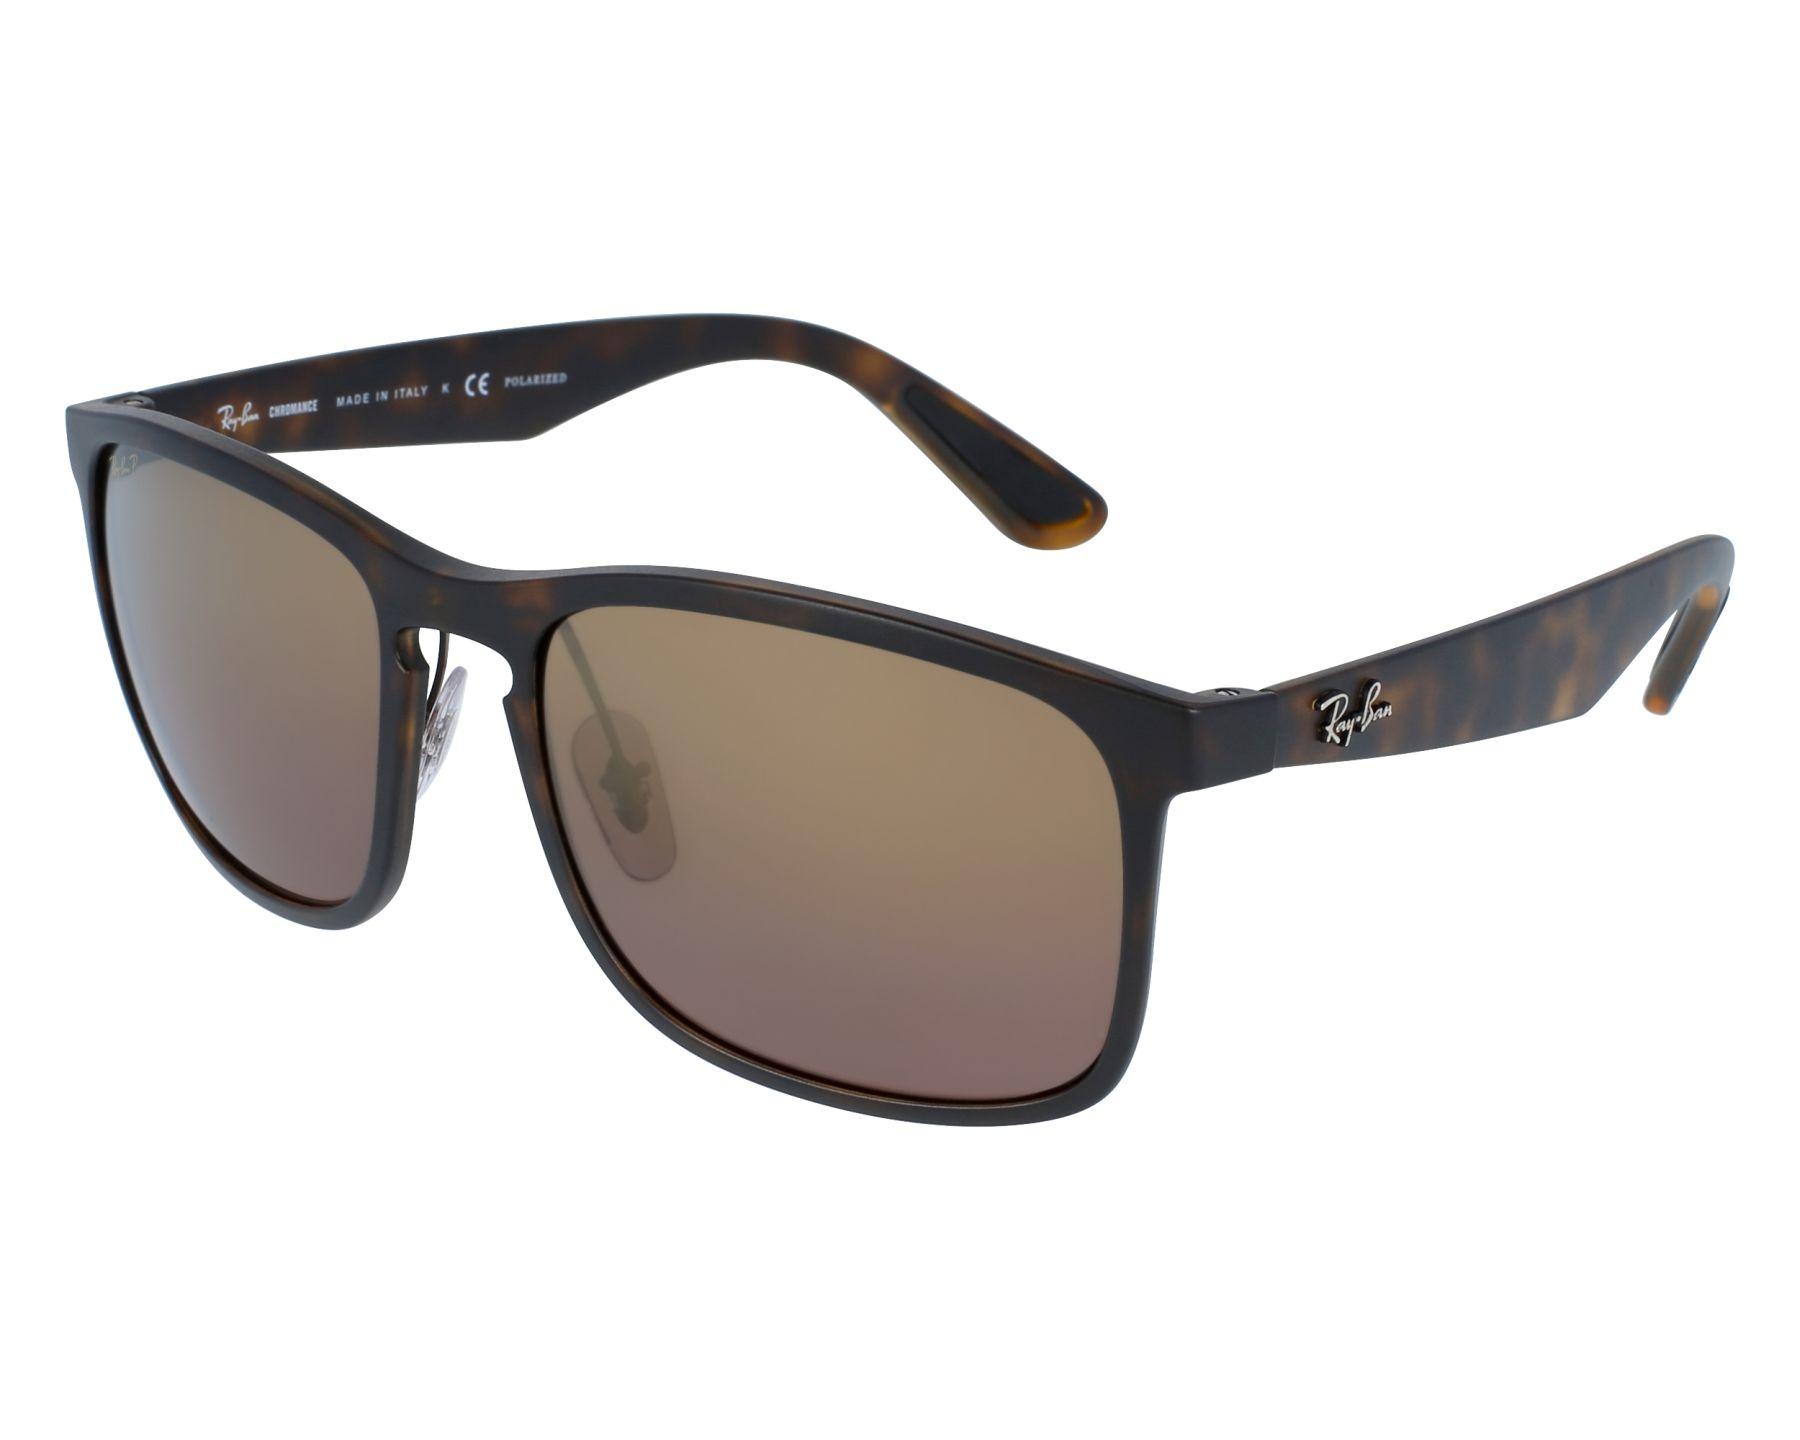 40b7260ea9 Sunglasses Ray-Ban RB-4264 897 6B 58-18 Havana front view